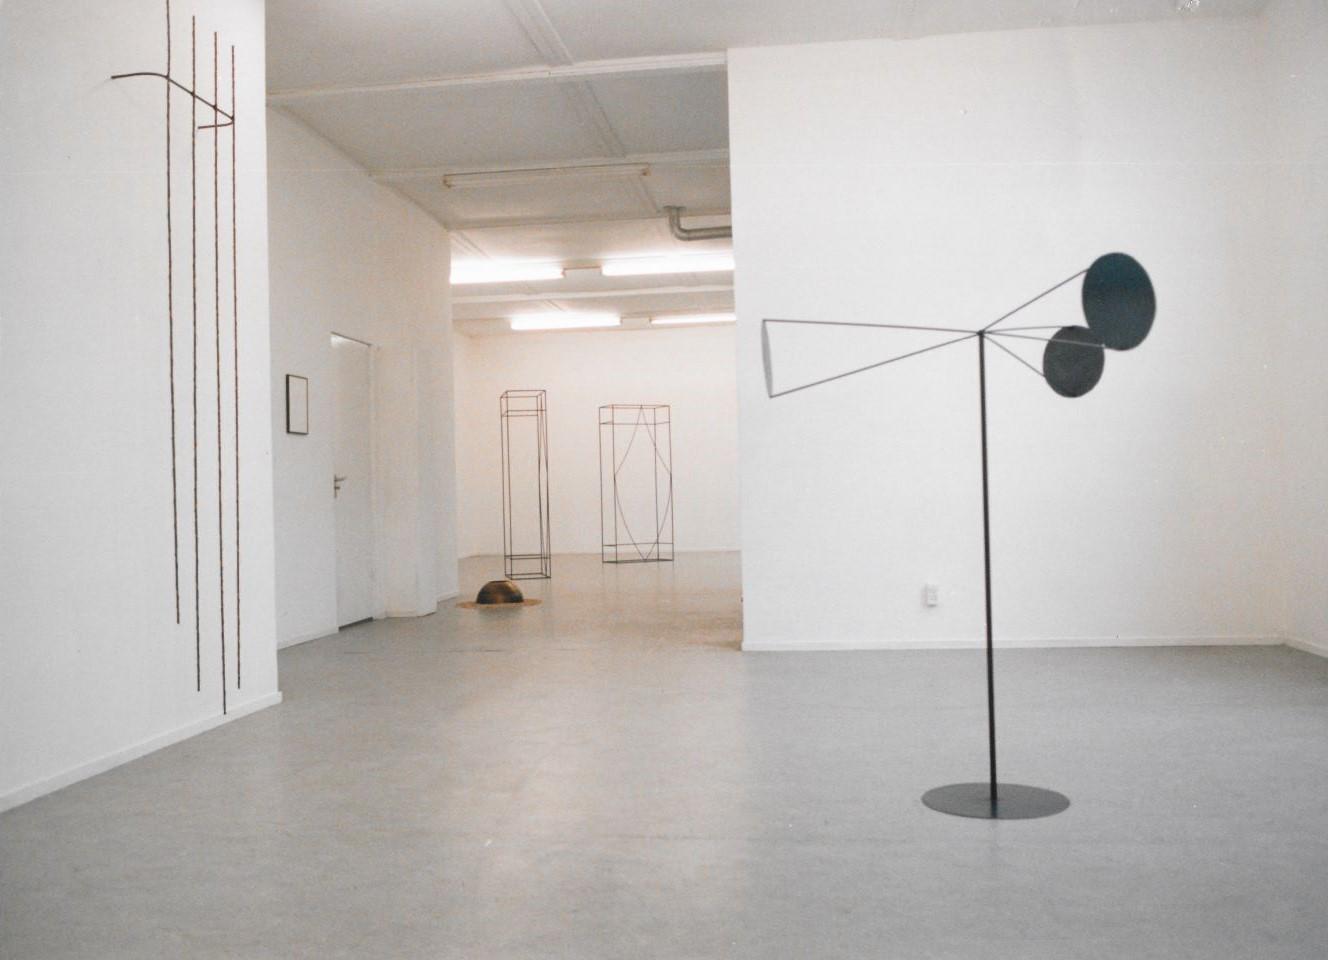 Frontaal ruimte voor hedendaagse kunst, Appingedam